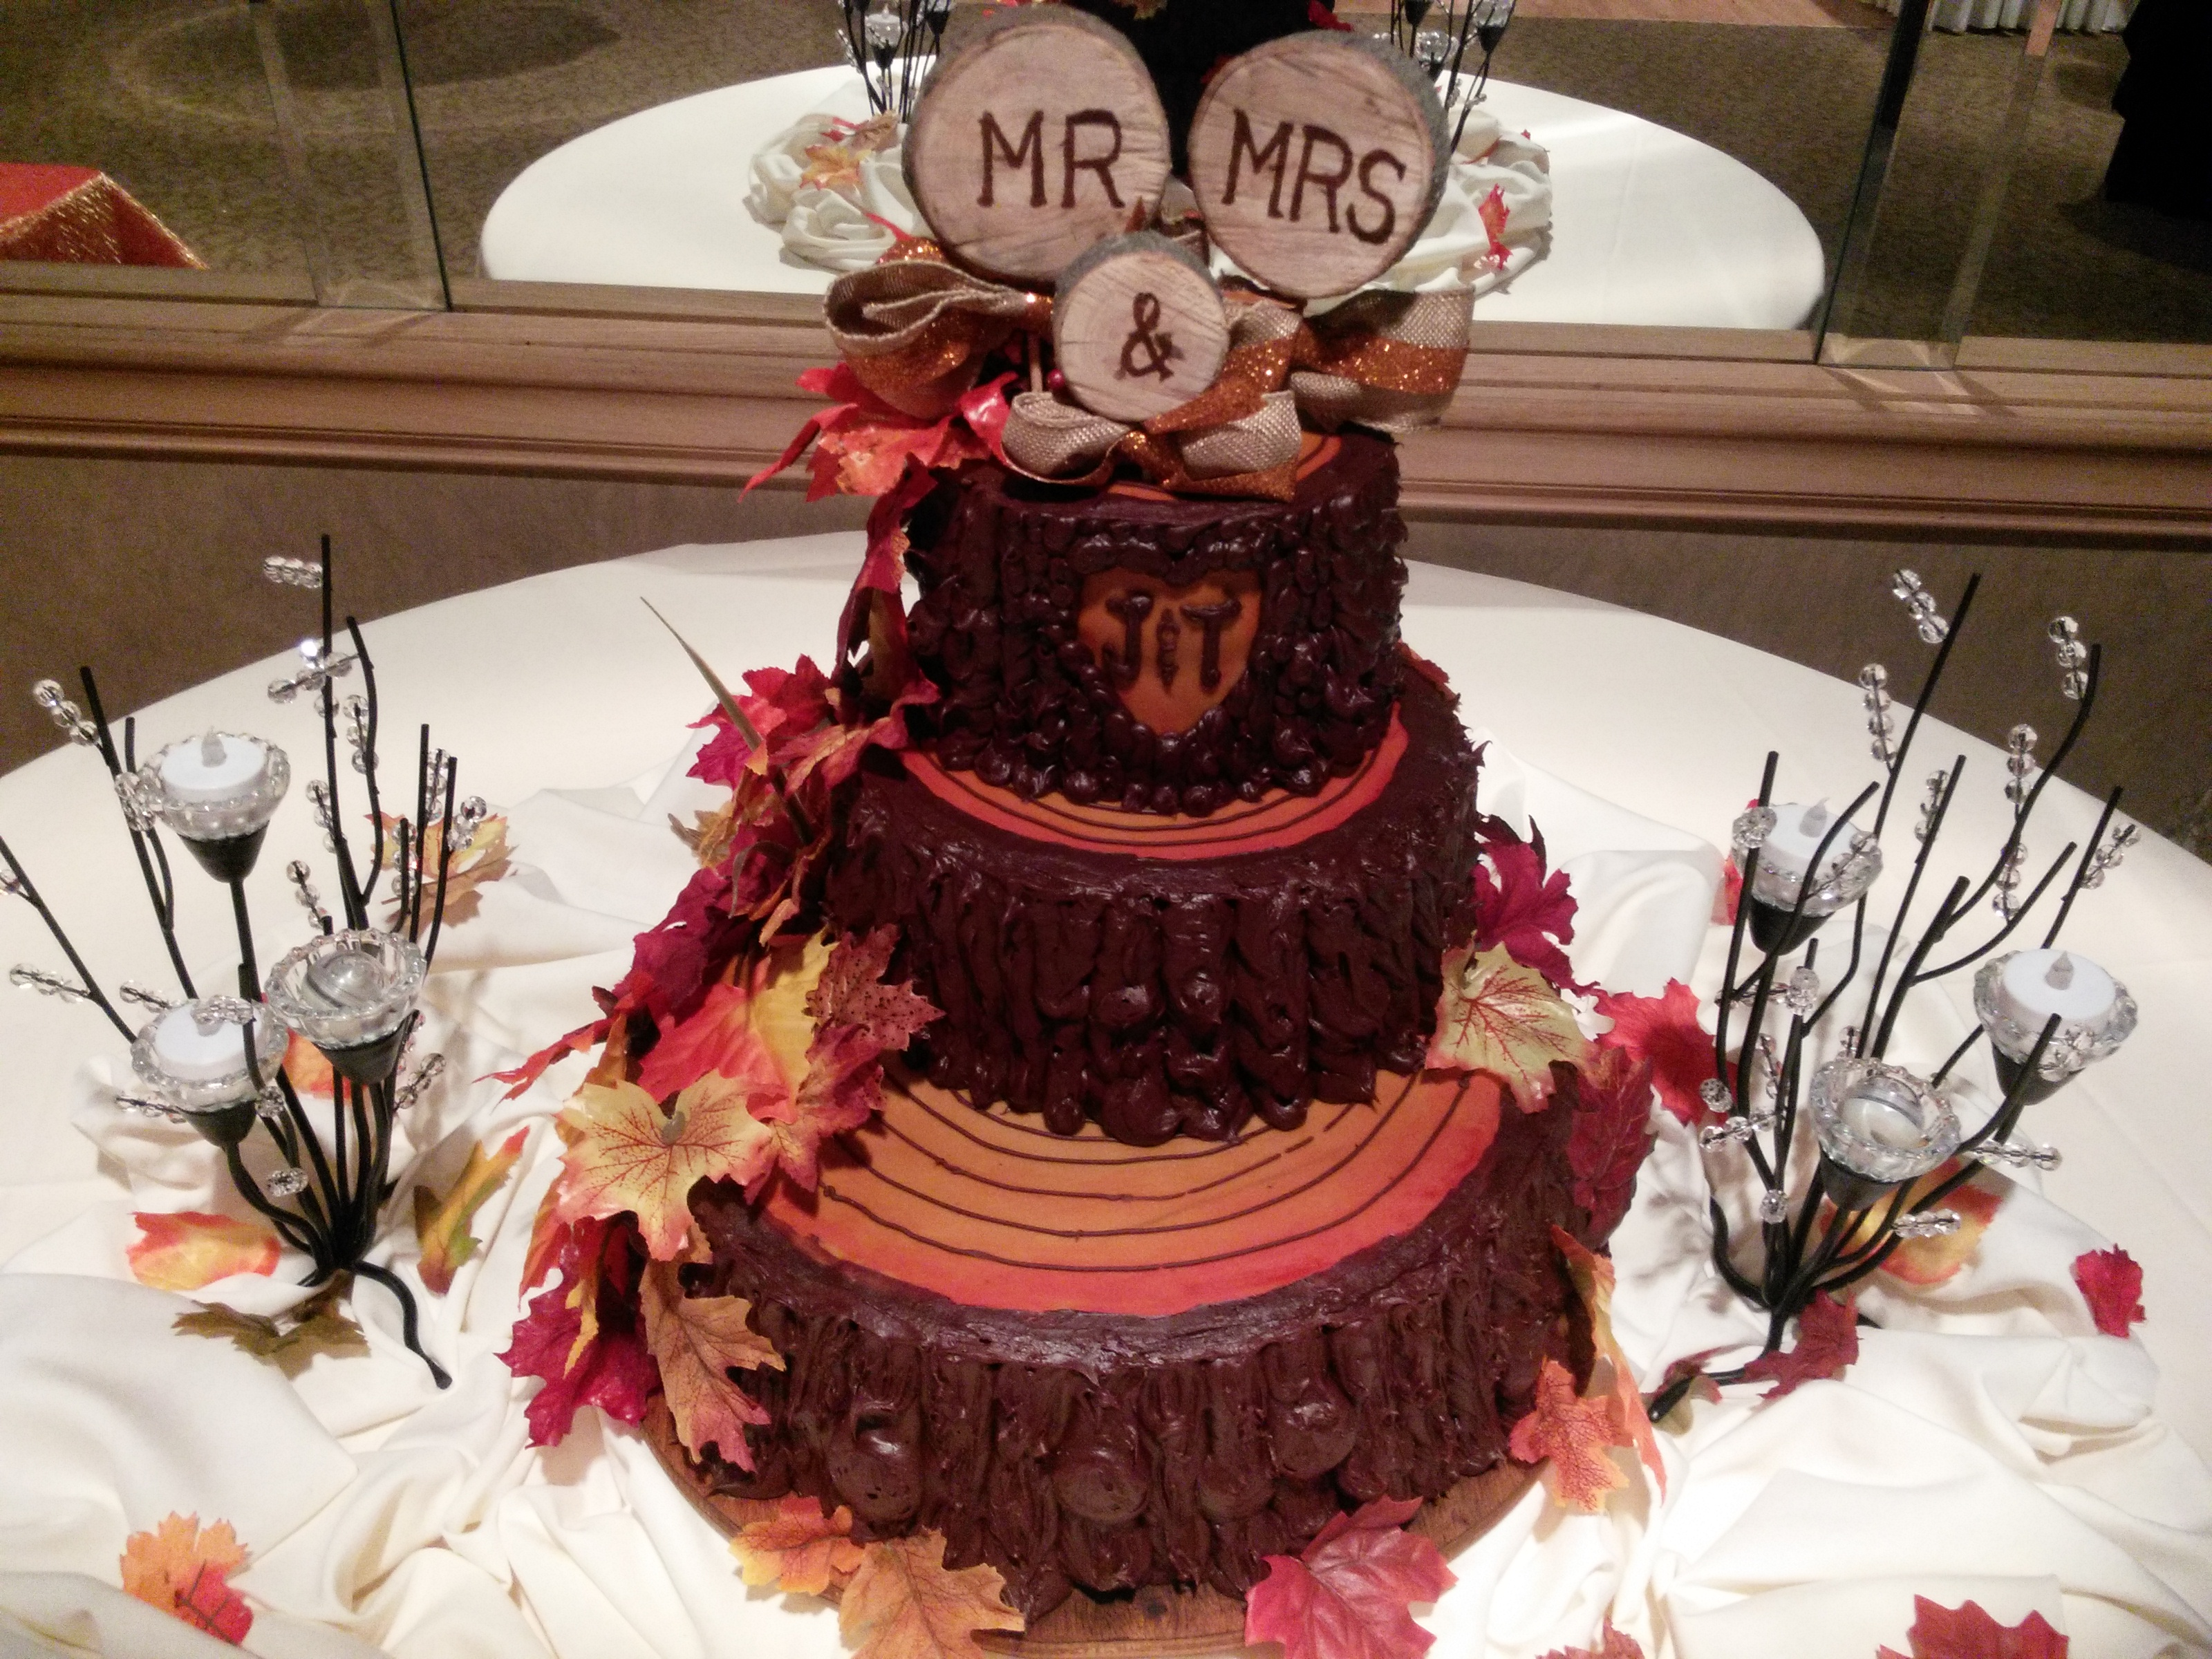 s Custom Wedding Cakes and Designer Specialty Cakes